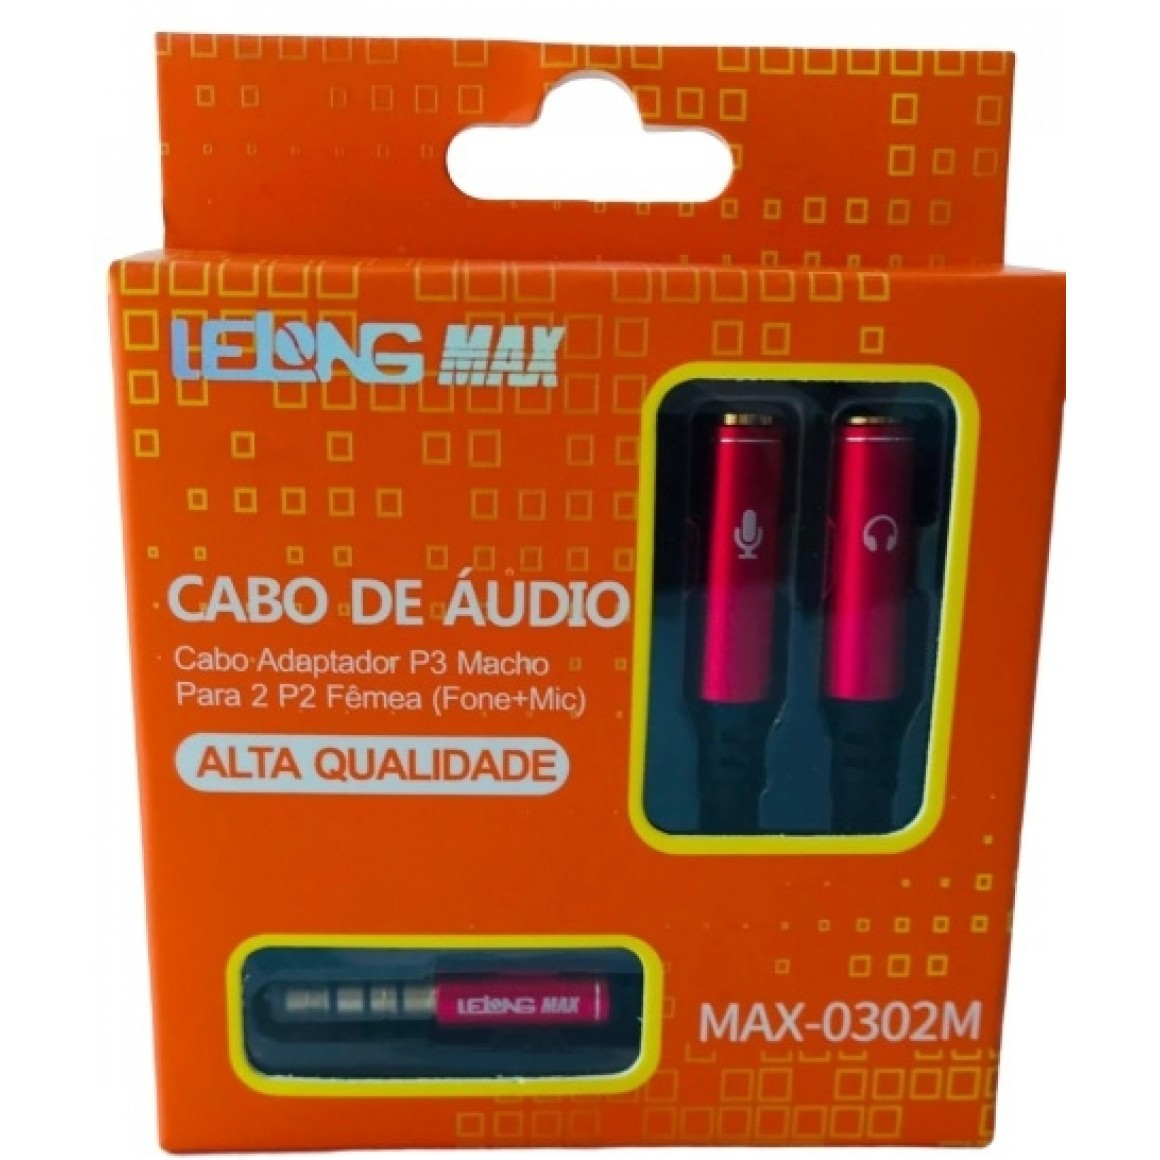 cabo de Áudio adaptador p3 Macho para 2 p2 fêmea lelong max-0302m